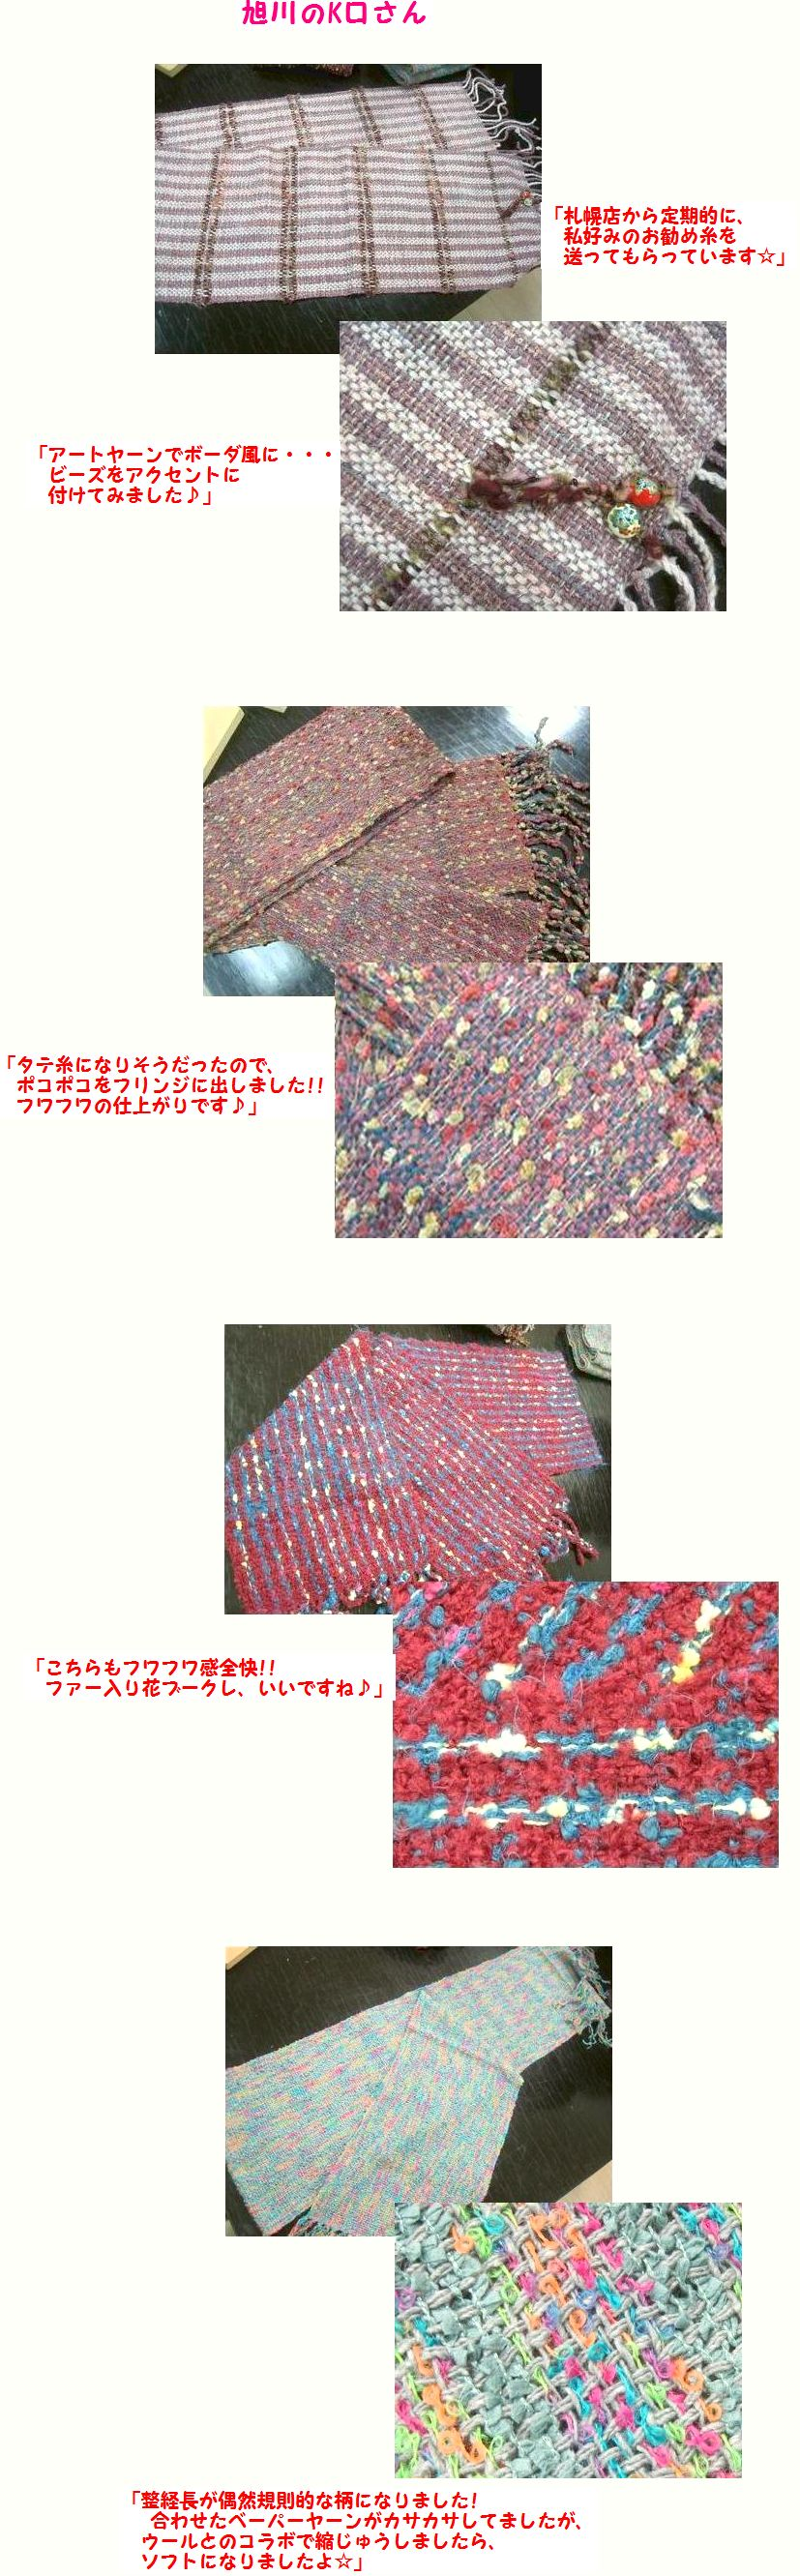 c0221884_025981.jpg